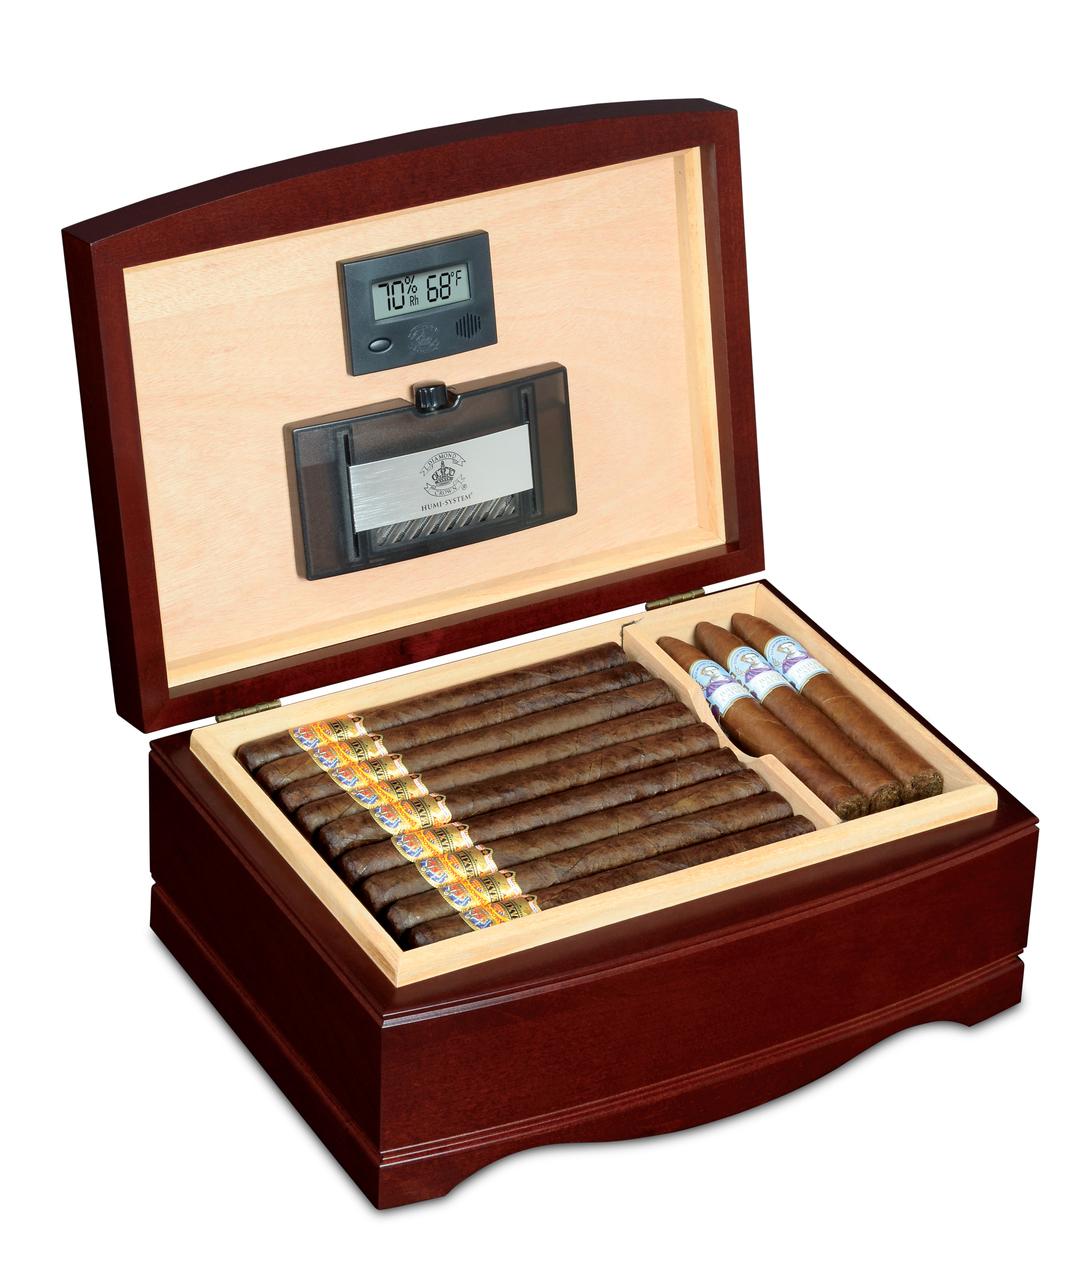 diamond-crown-washington-cigar-humidor-h3810-110-american-chest-series-2.png